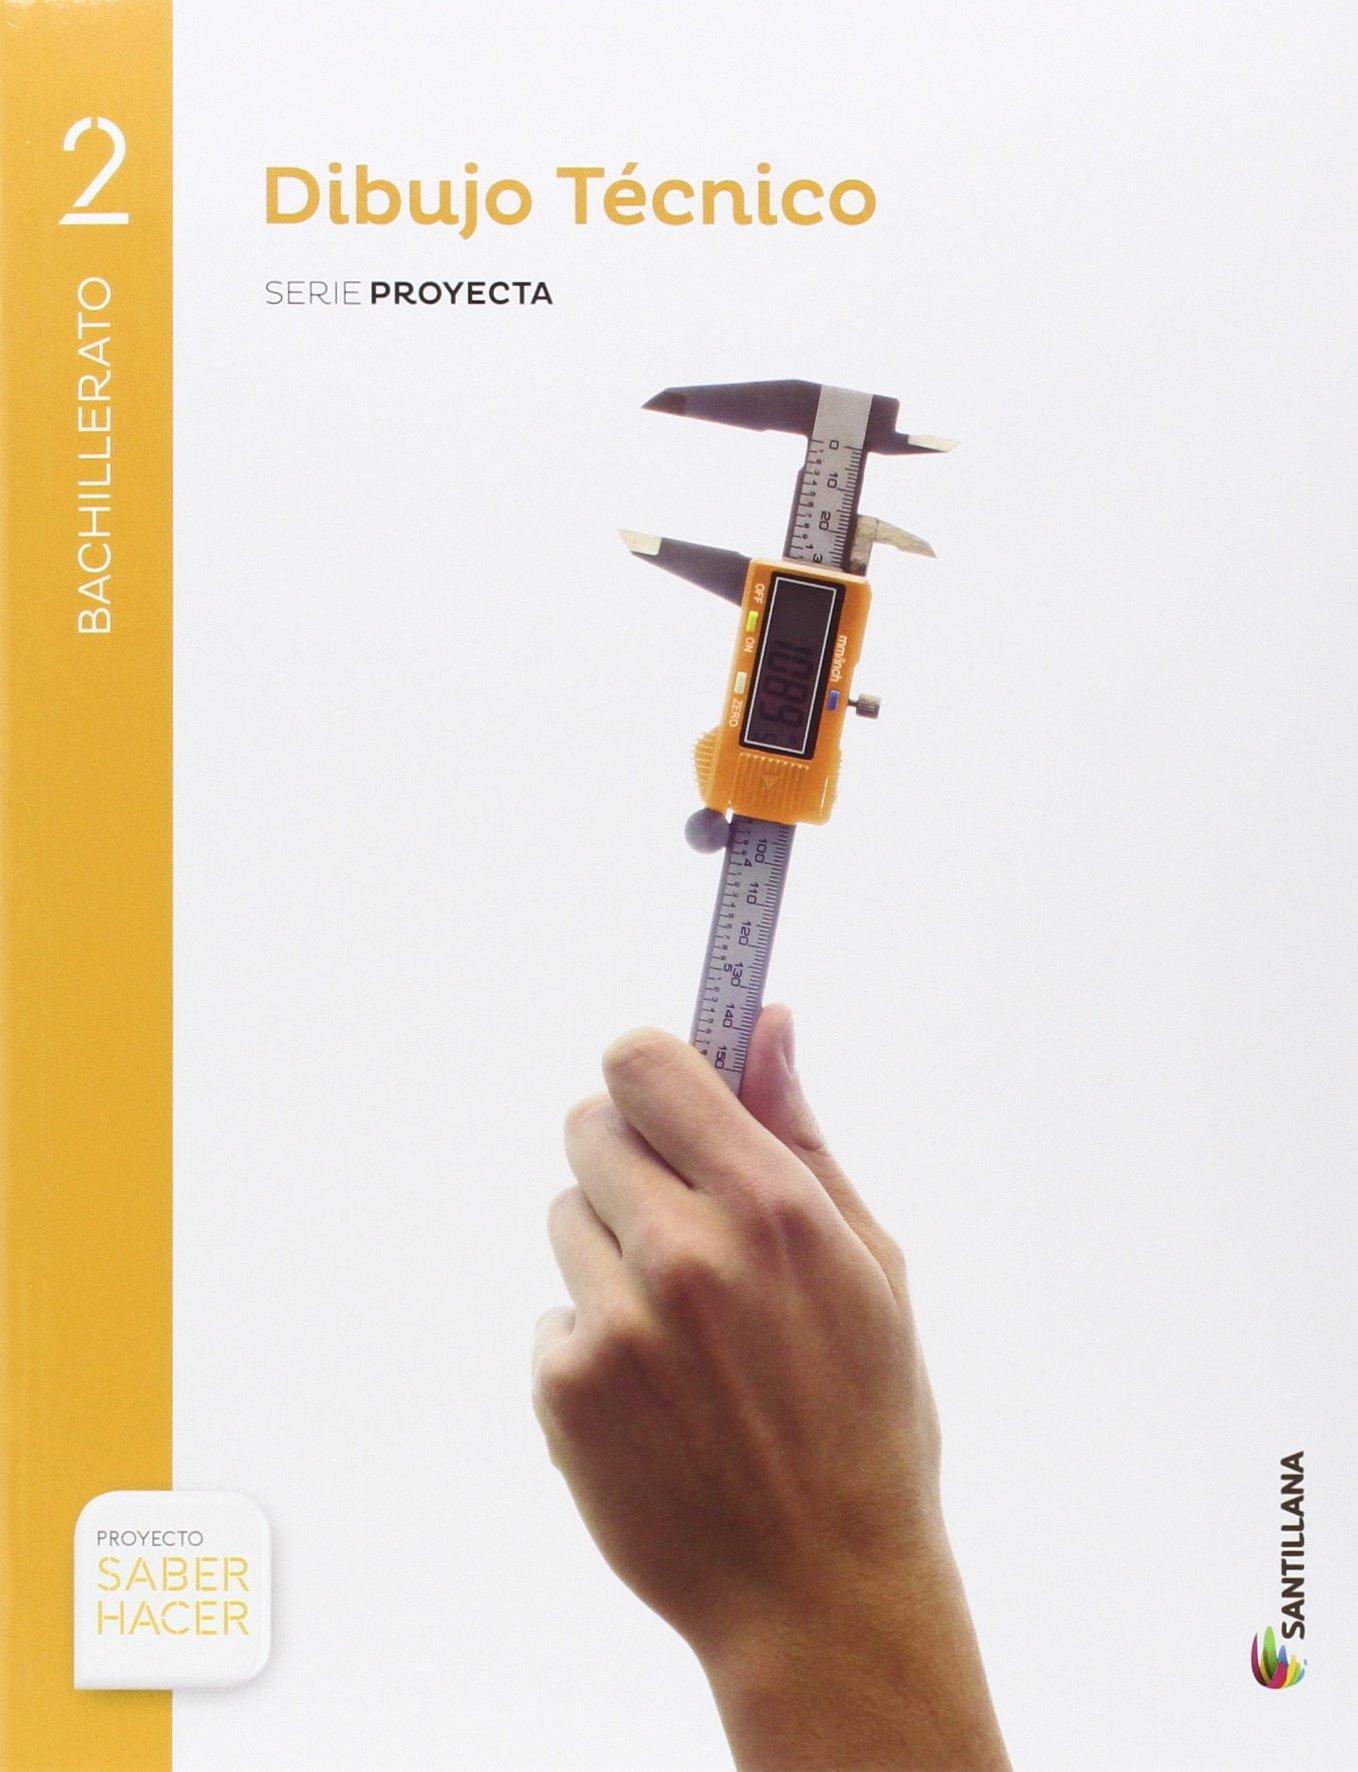 DIBUJO TÉCNICO SERIE PROYECTA 2 BTO SABER HACER - 9788468032214: Amazon.es: Vv.A.A: Libros